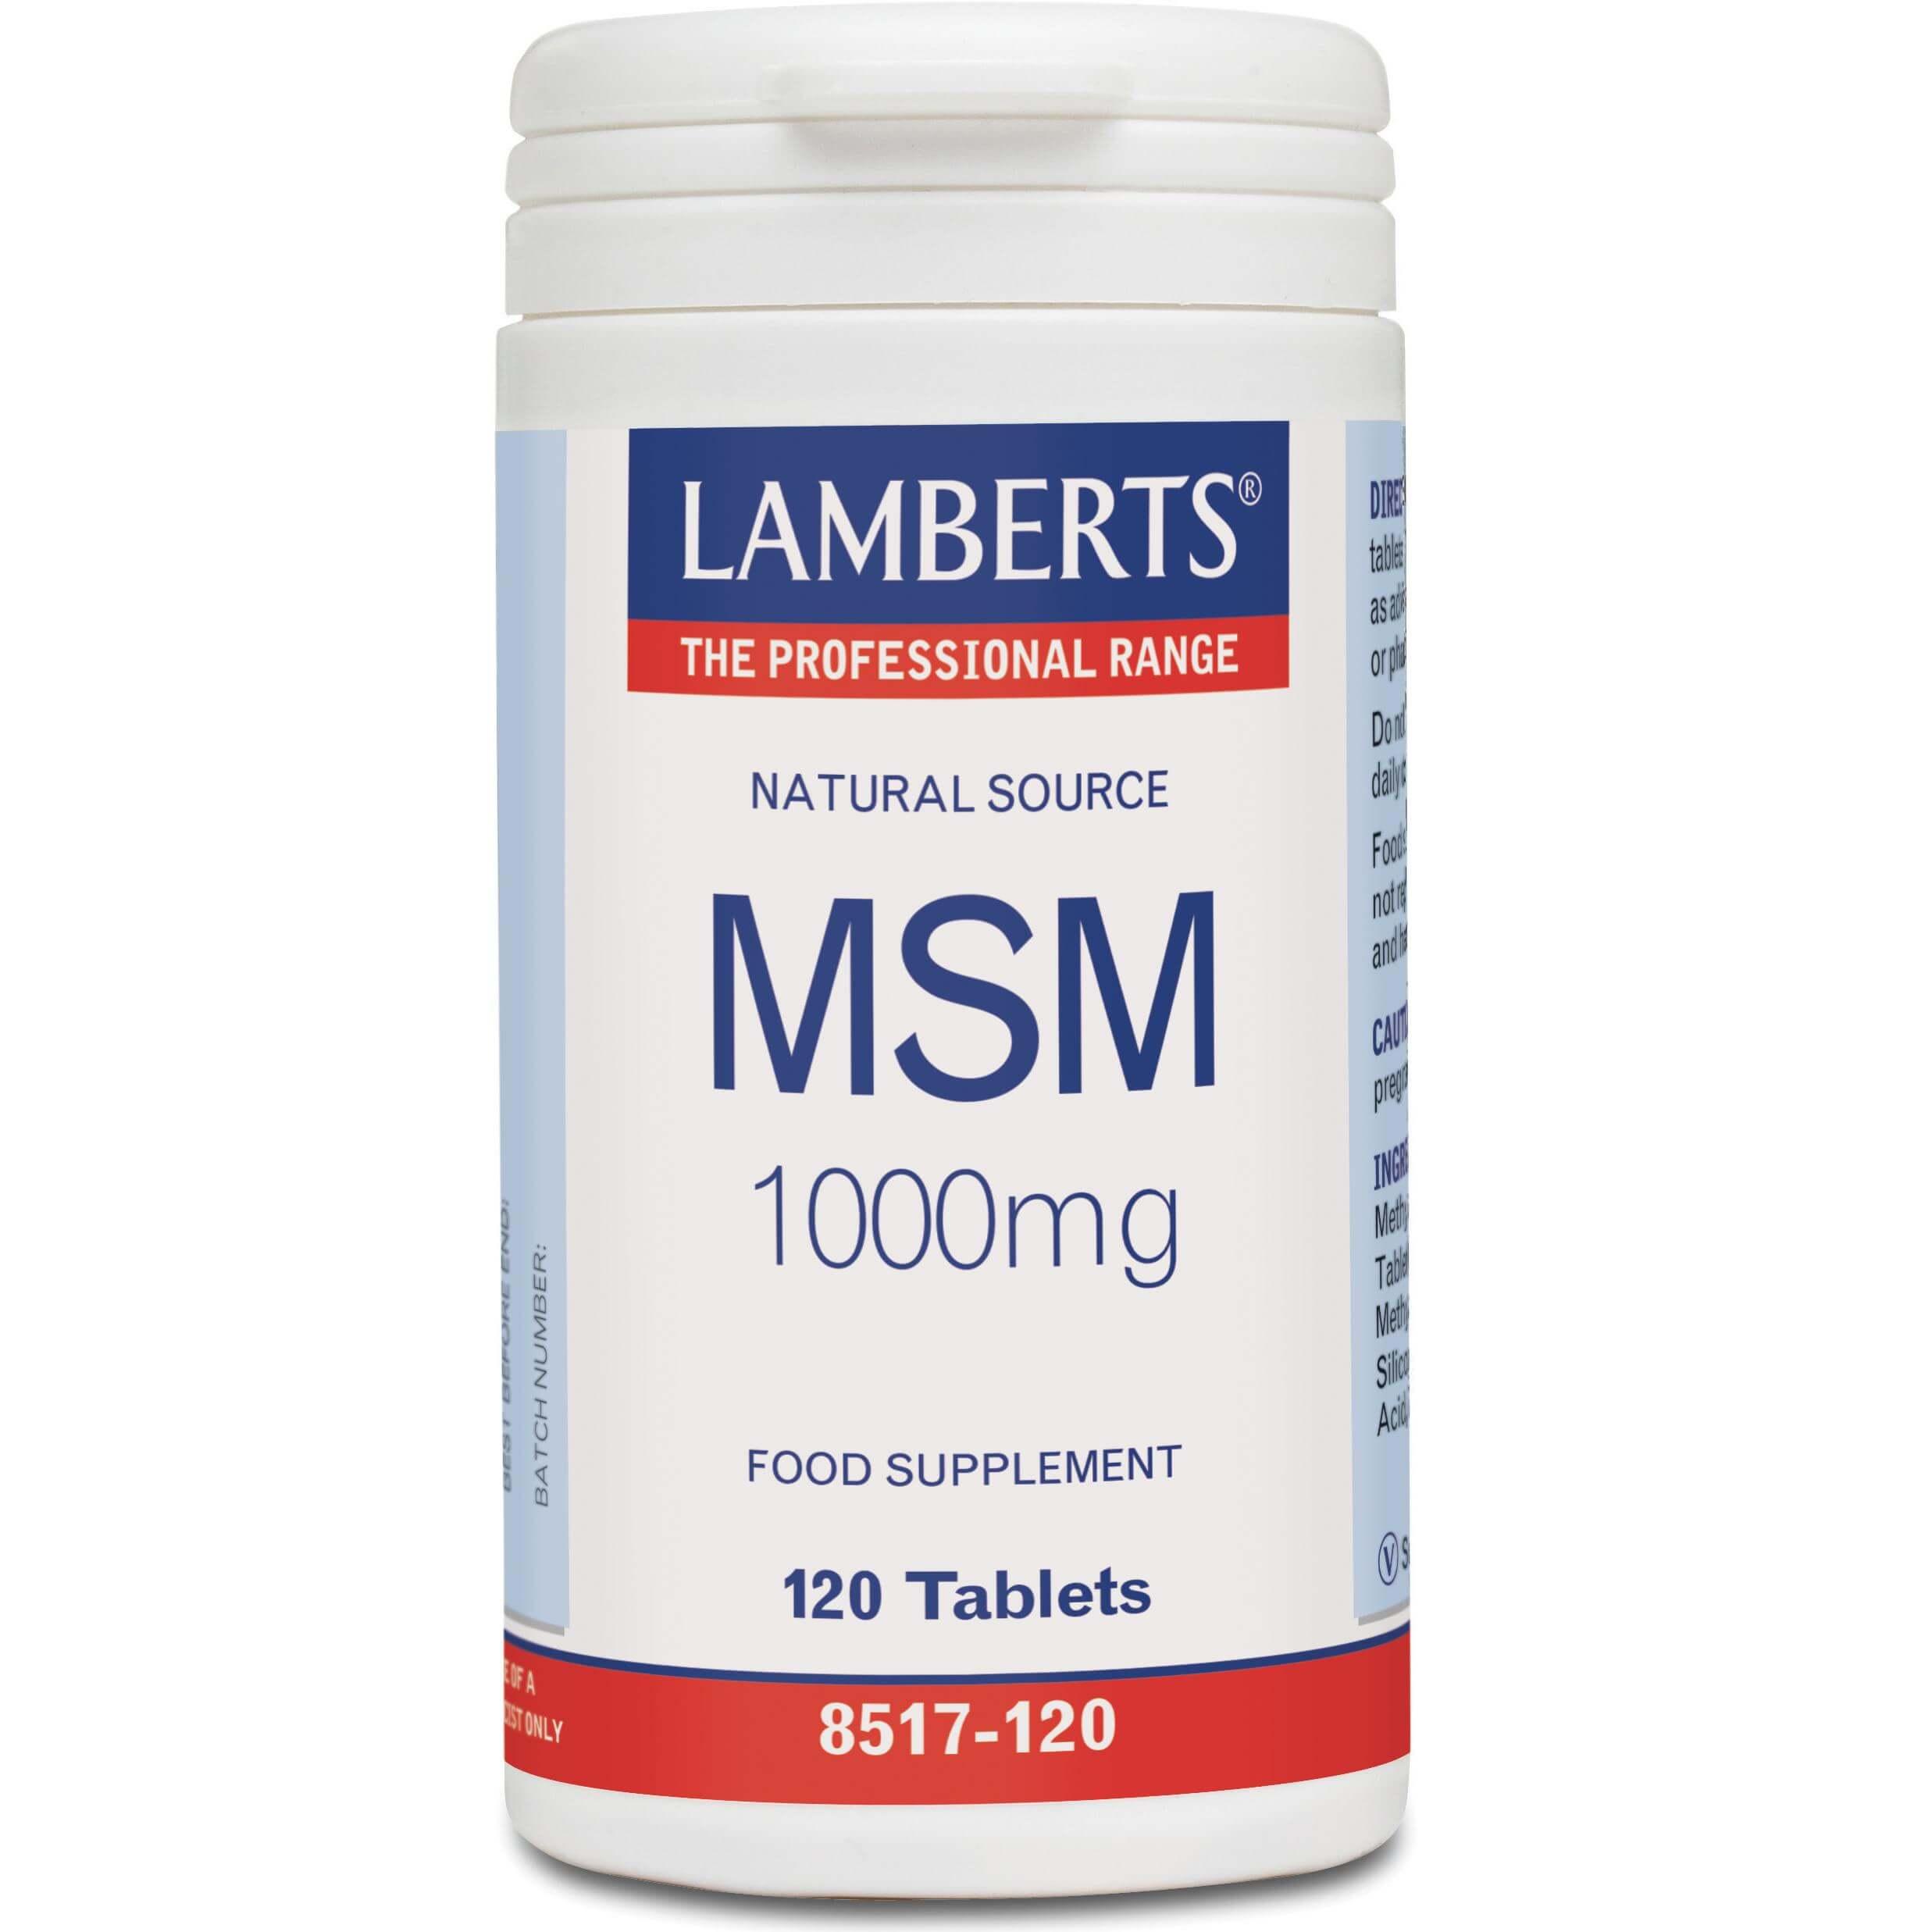 Lamberts MSM Συμπλήρωμα γιατηΔιατήρηση της Υγείας των Αρθρώσεων 1000mg 120 Ταμπλέτες